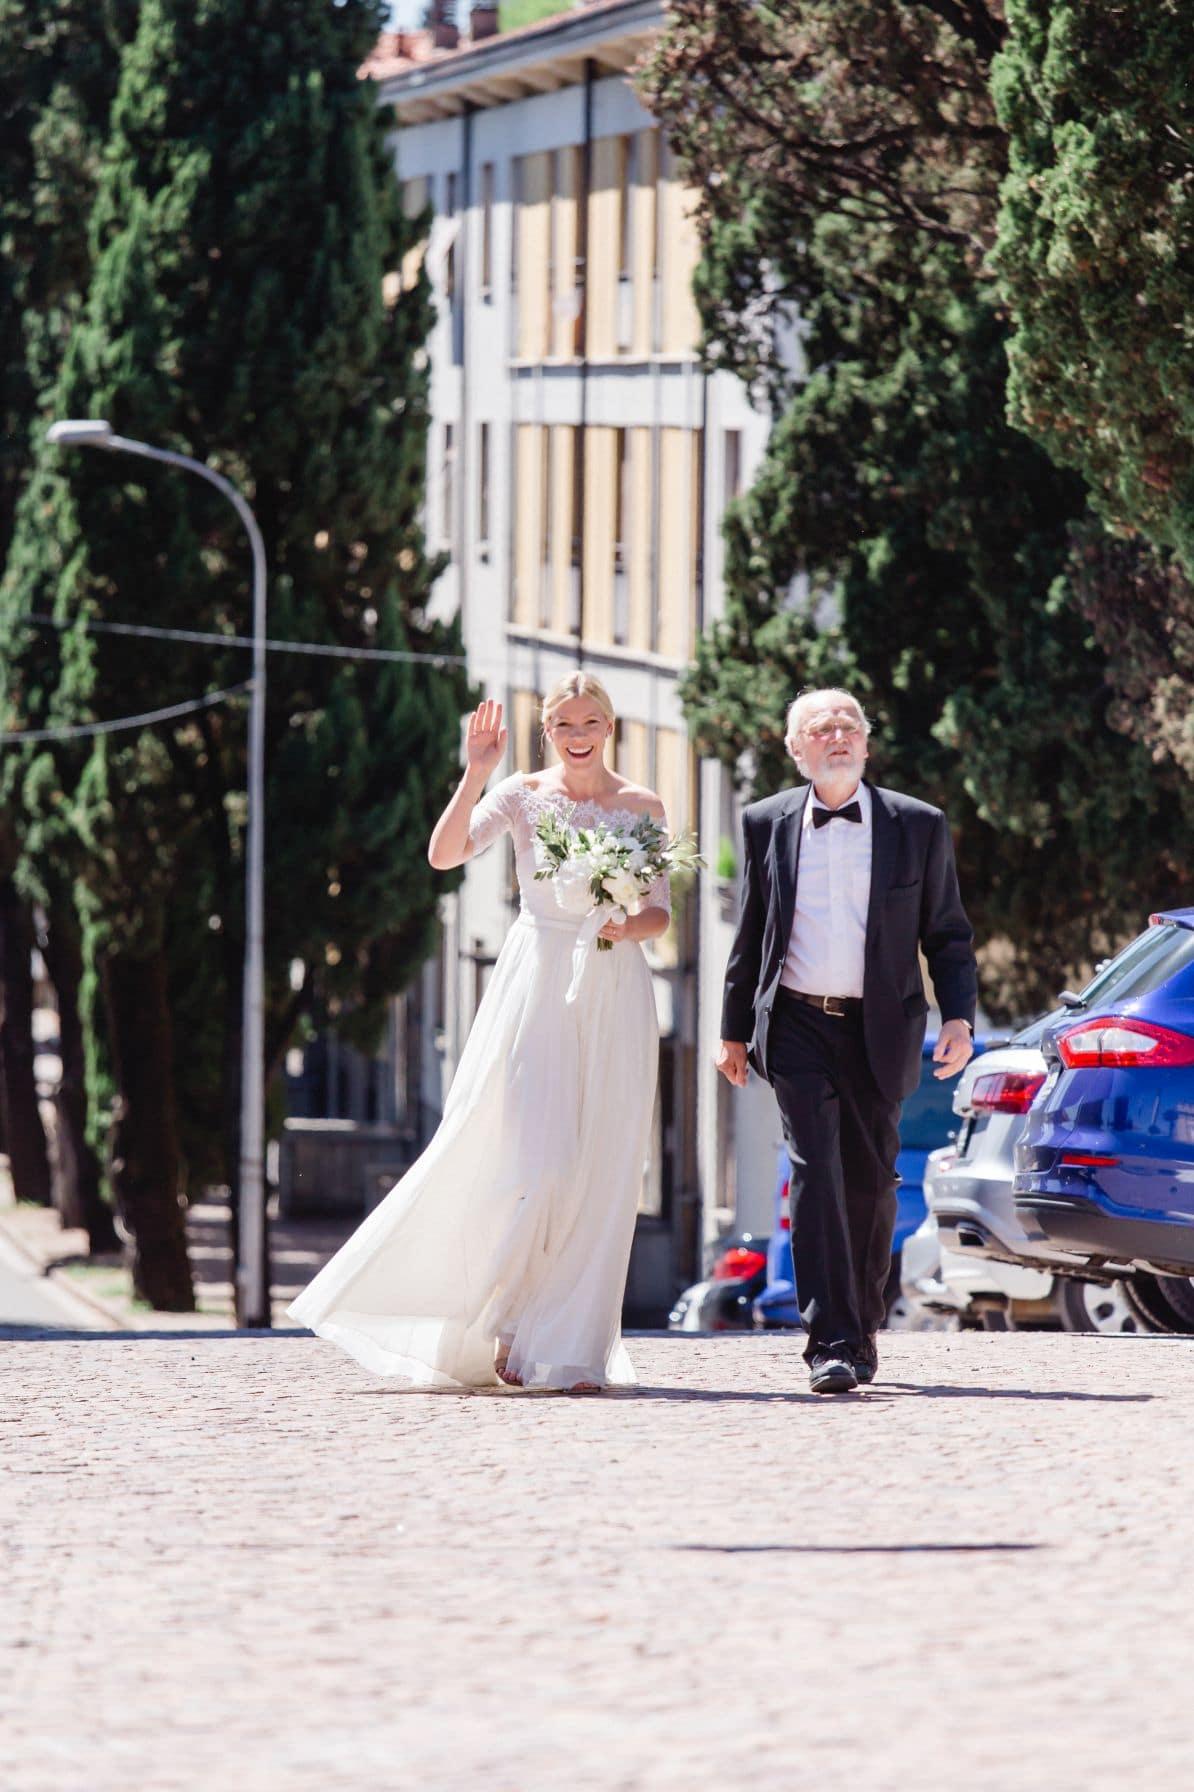 Million Memories_A&D_Hochzeitsfotograf_Schlosshochzeit_Toskana_Lago Di Como_Wedding_Tuscany_081